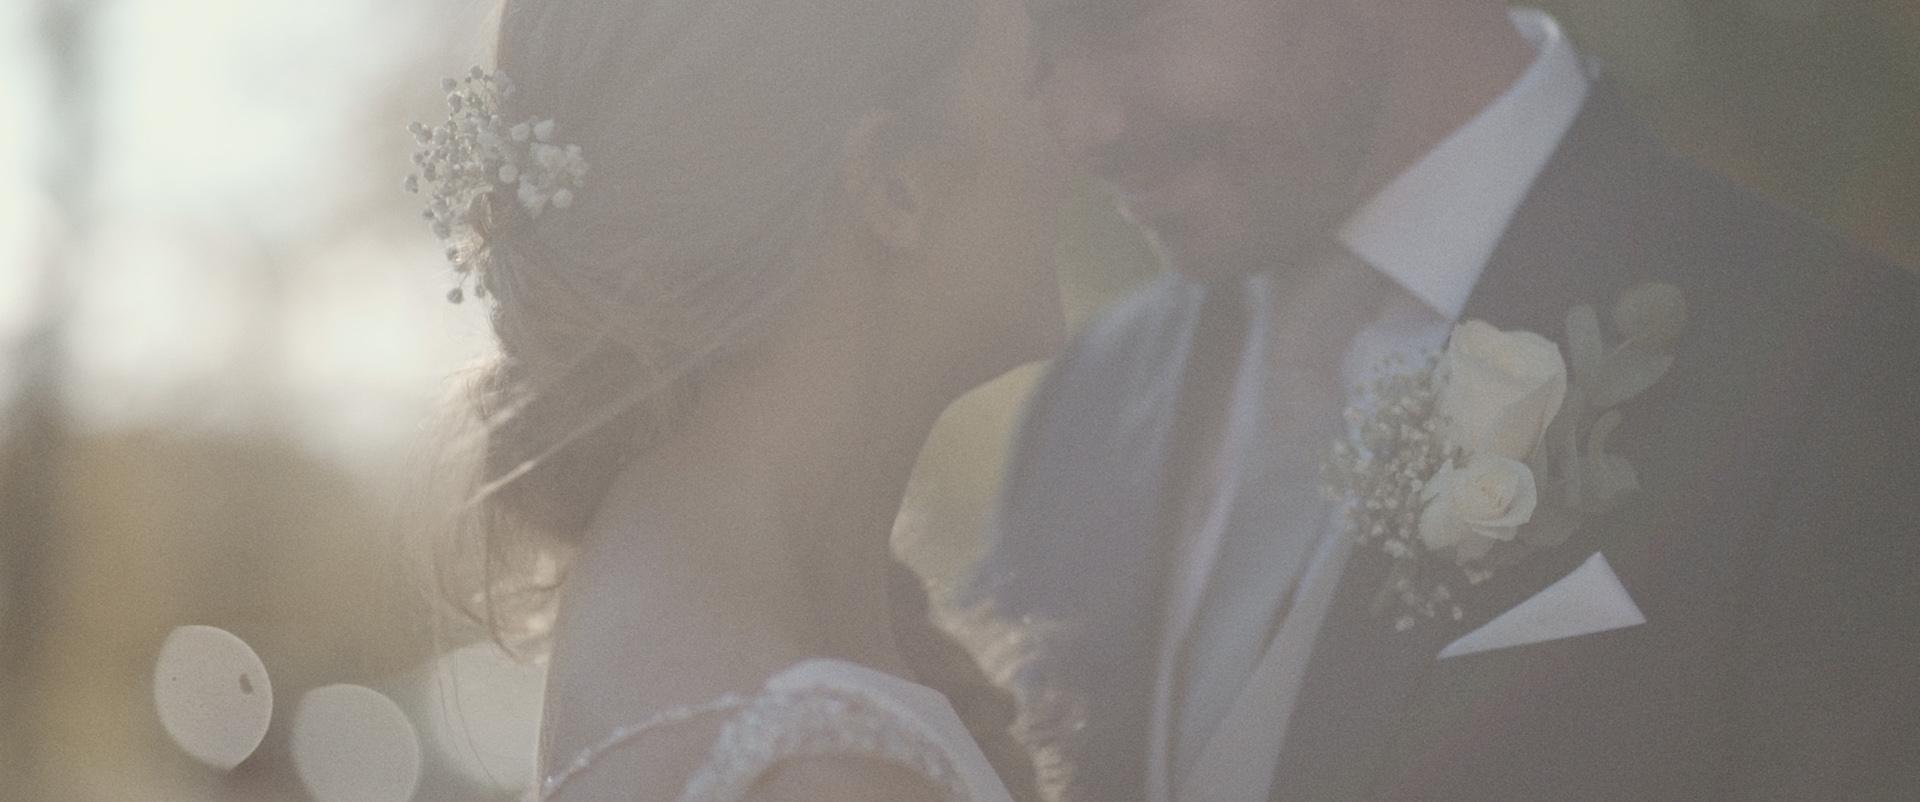 moon+river+wedding+videography+cinematography+newton+hall+north+east